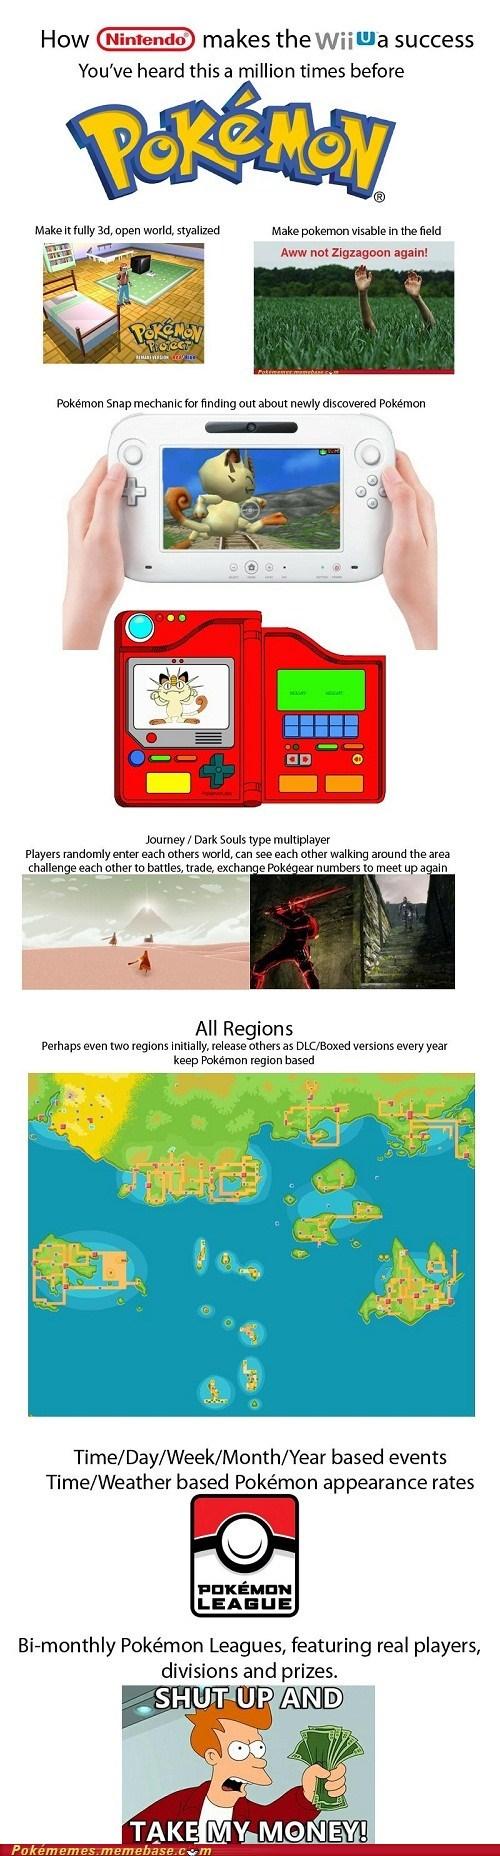 gamefreak,nintendo,Pokémon,the internets,video games,wii U